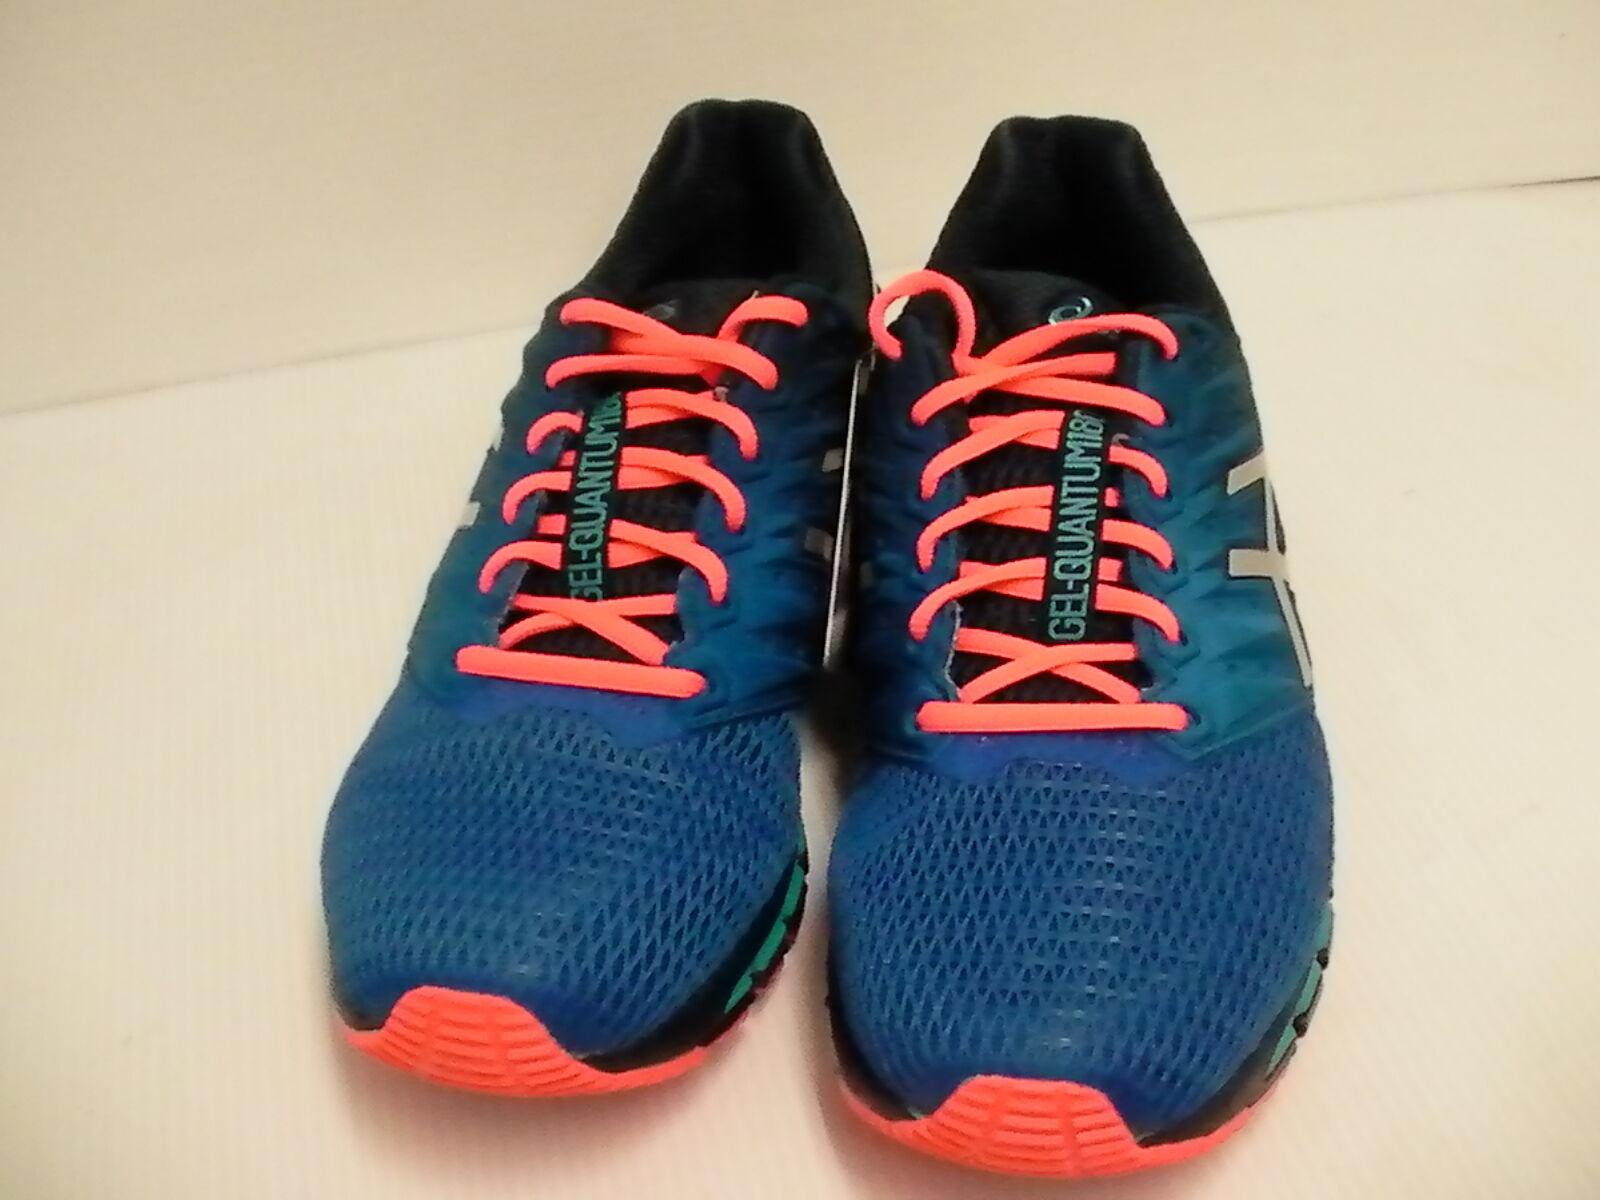 Asics gel quantum 180 2 dark running navy men running dark shoes size 12 us acbc75